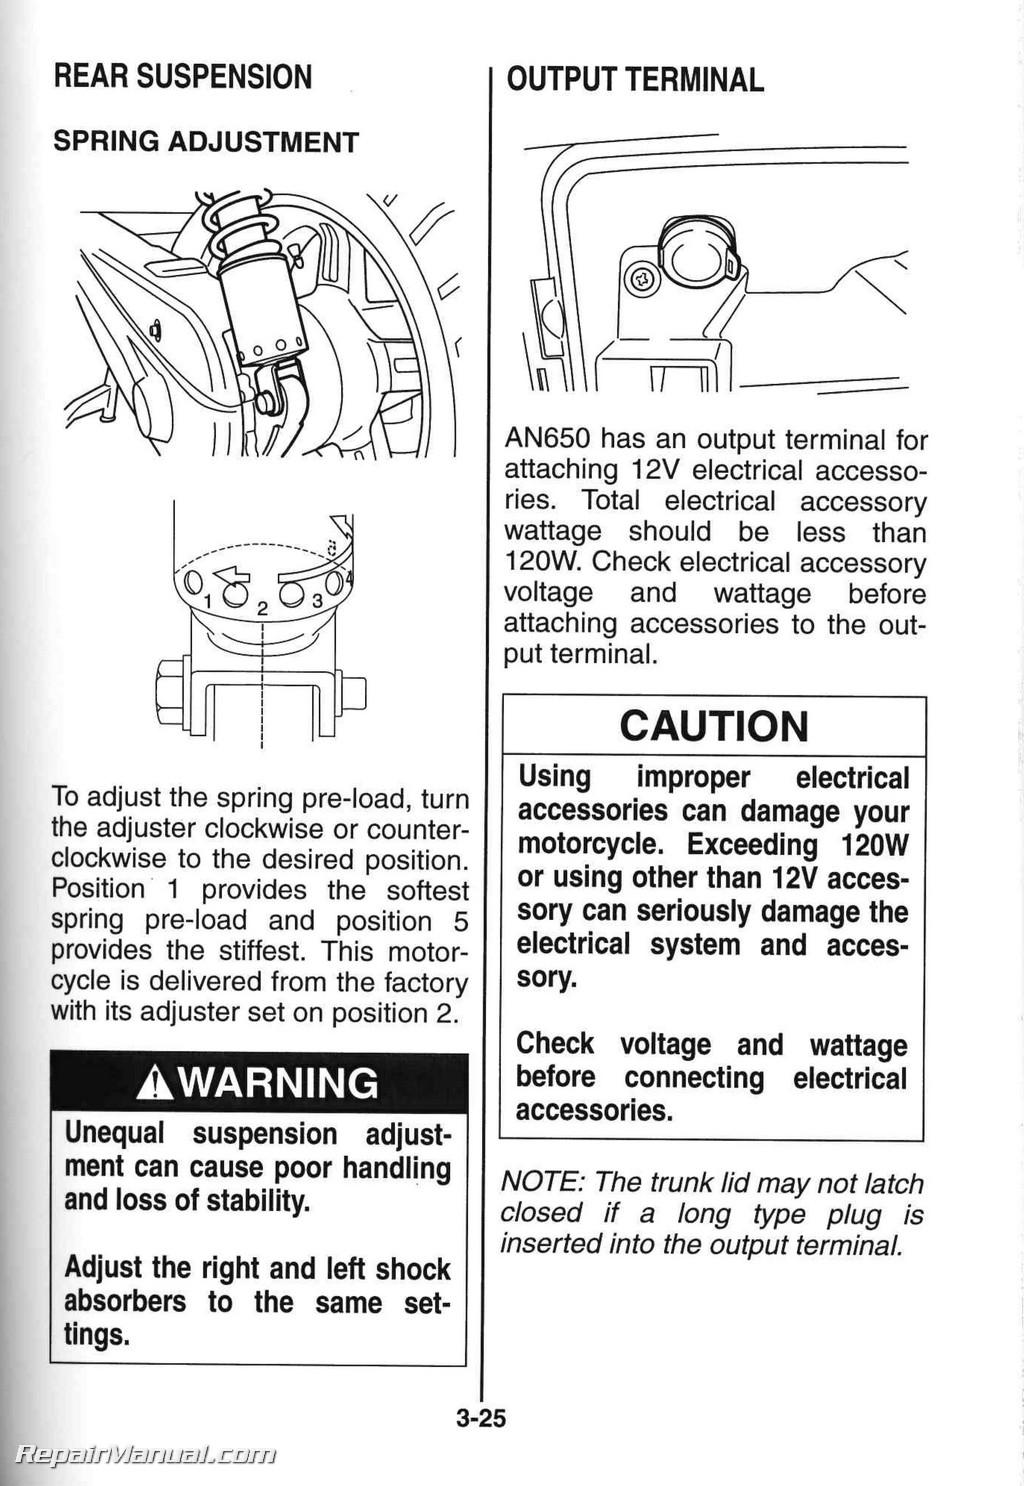 2005 chrysler 300 owners manual pdf